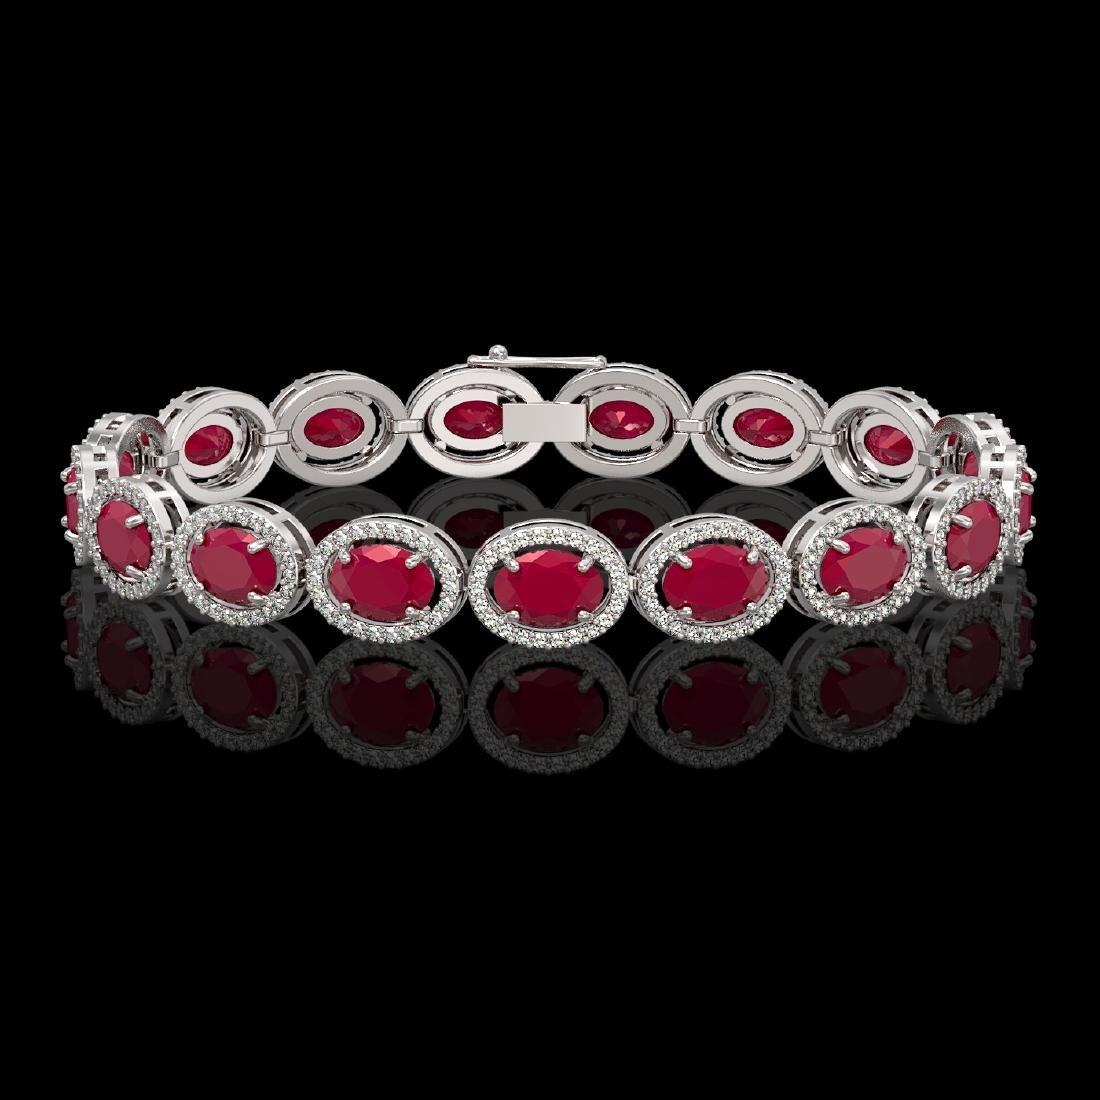 22.89 CTW Ruby & Diamond Halo Bracelet 10K White Gold